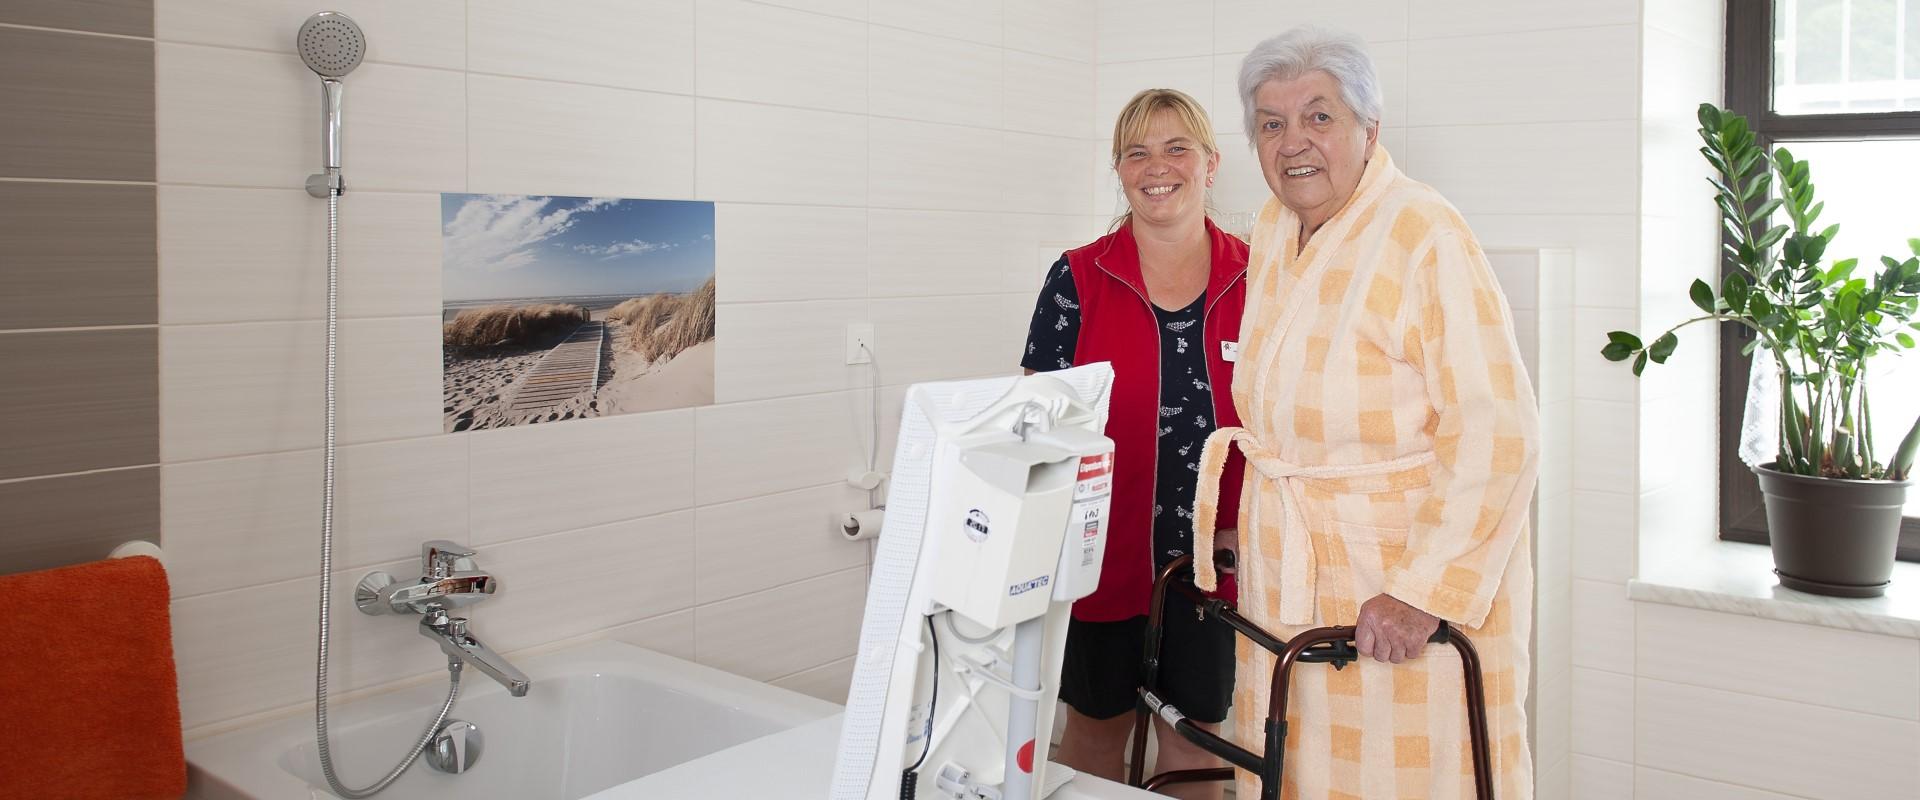 Pflegeeinrichtung Anja Illing